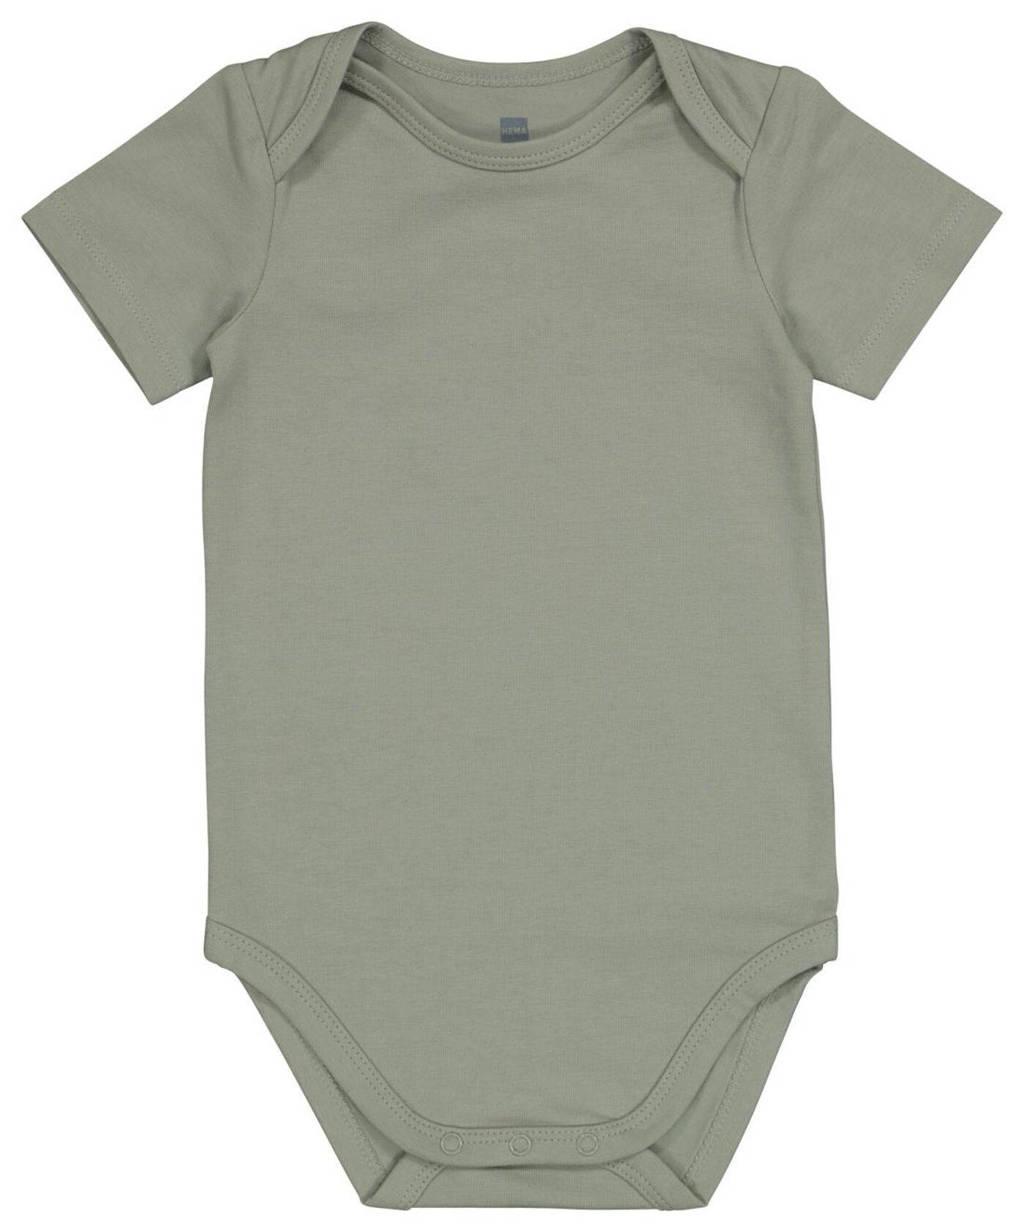 HEMA baby newborn romper groen, Groen